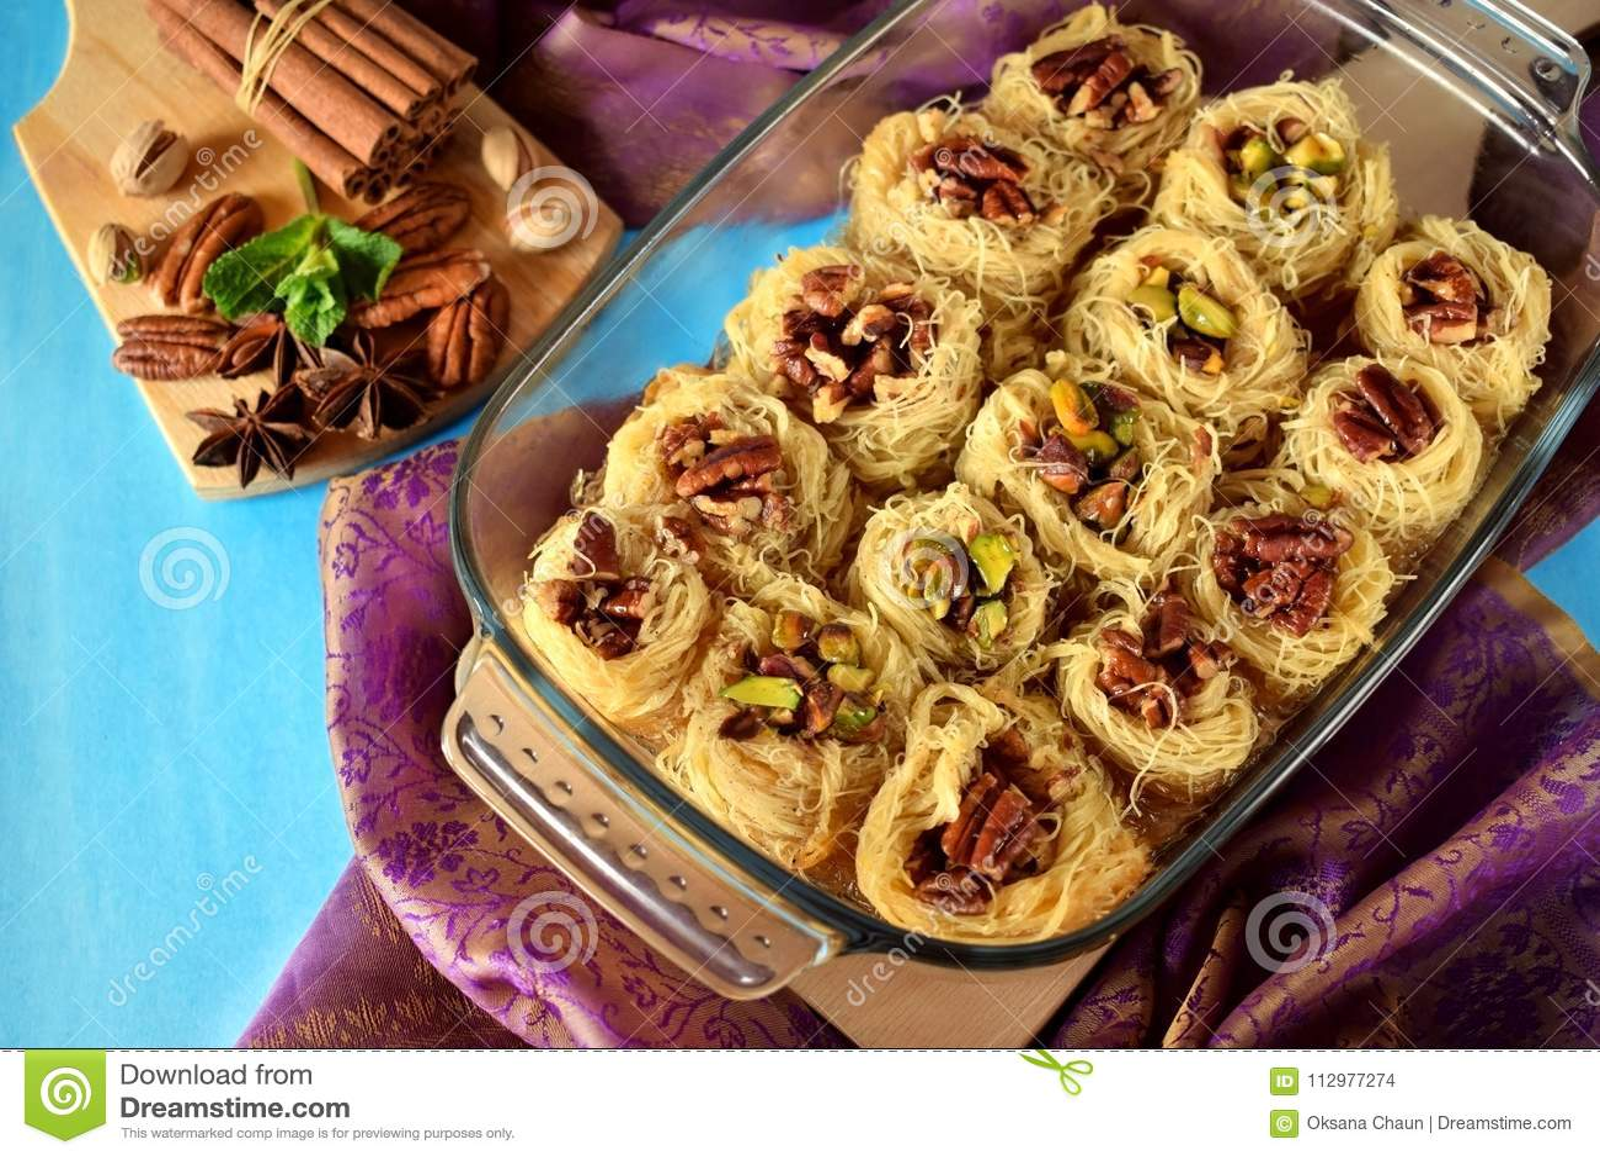 Egyptian dessert Kunafa made of kataifi dough with pistachio and pecan nuts